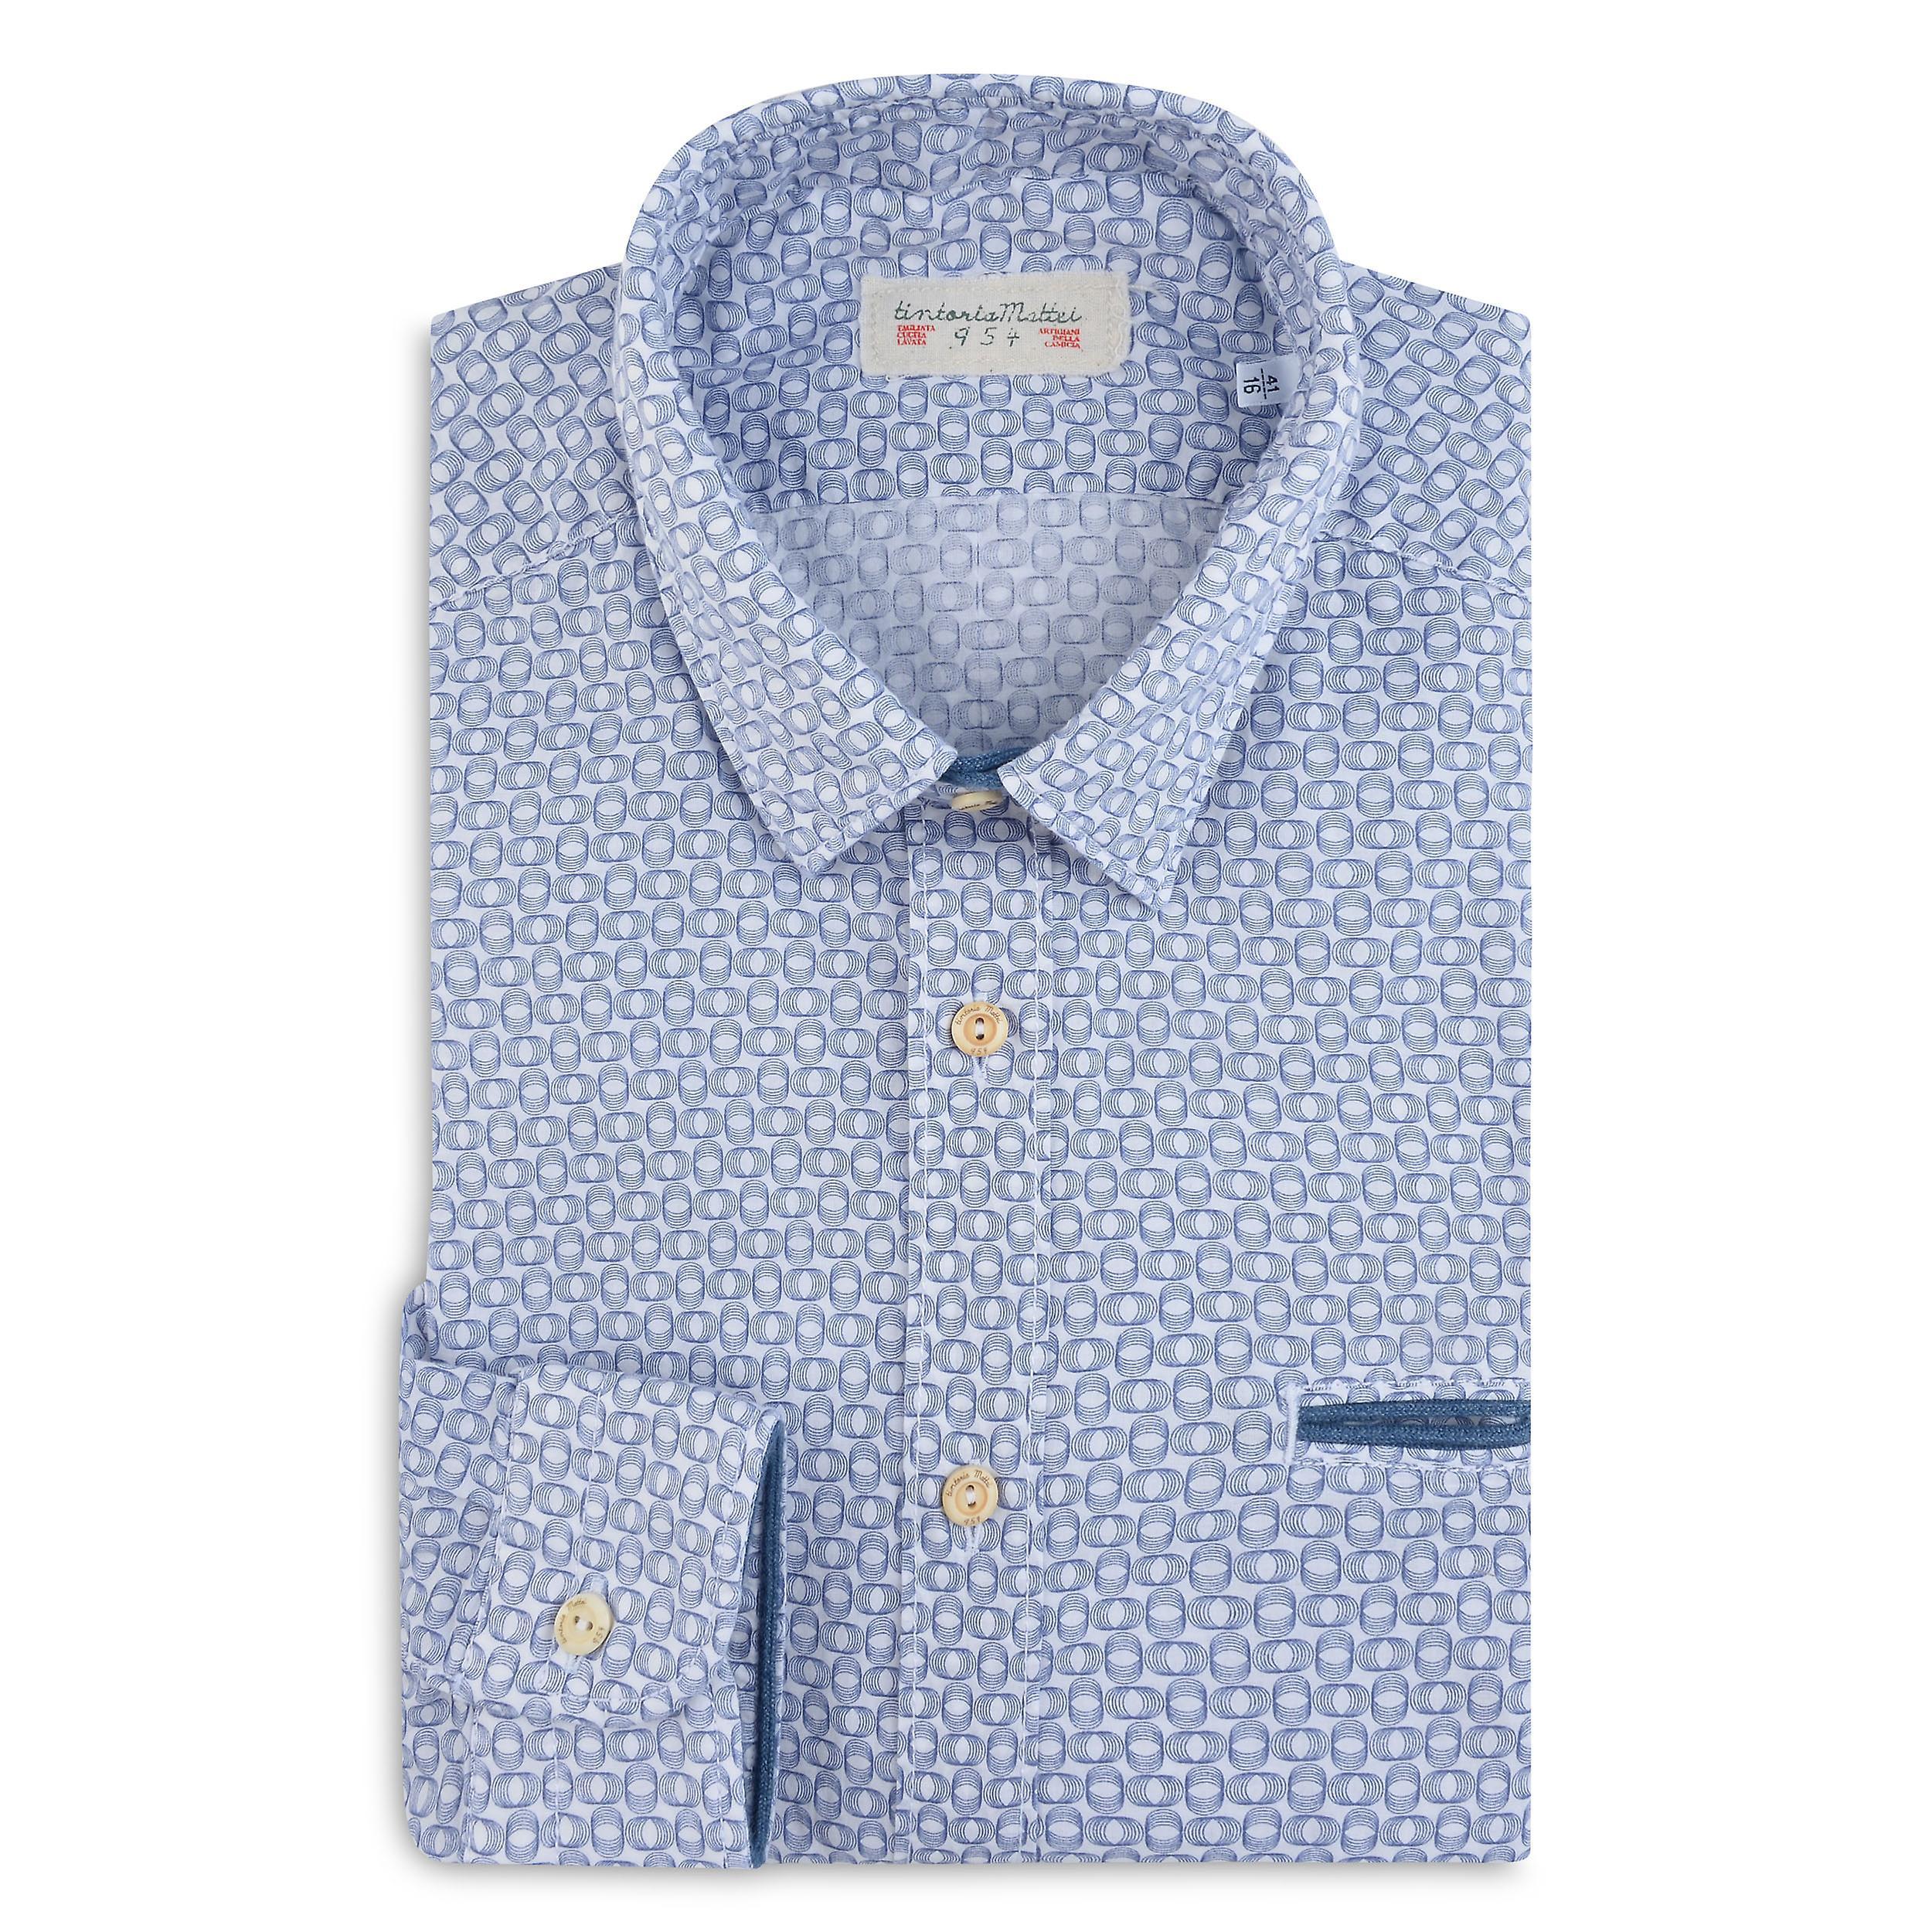 Fabio Giovanni Montedoro Shirt - Mens Italian Casual Stylish Shirt 100% Cotton - Long Sleeve